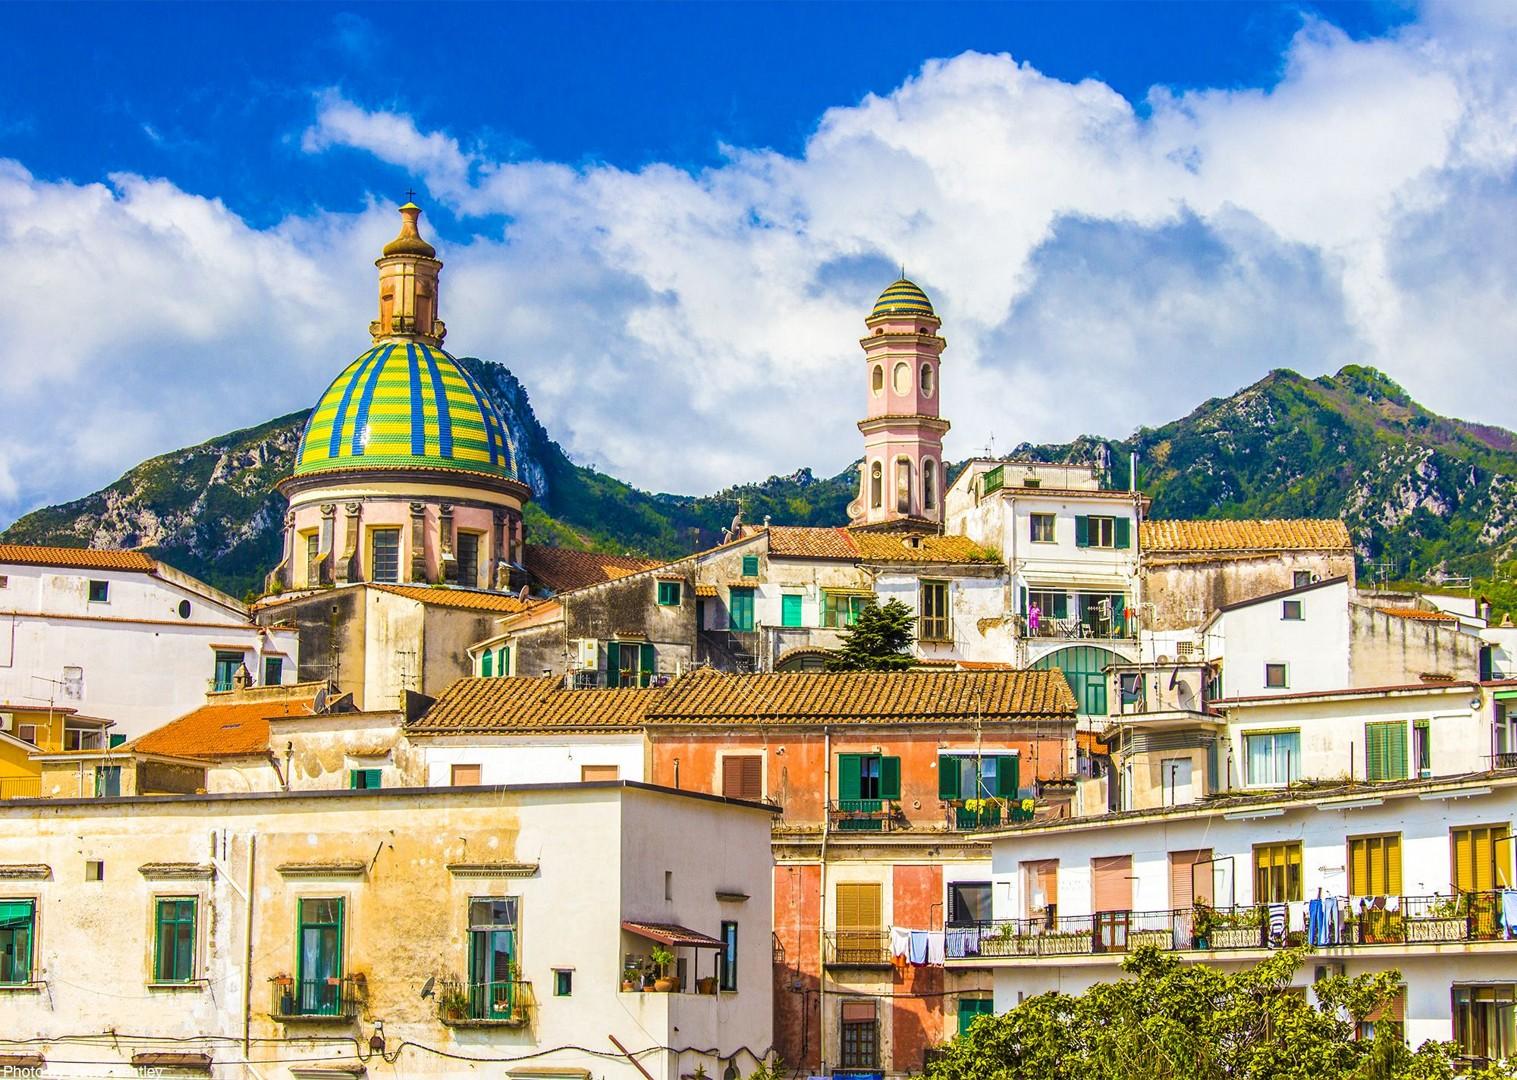 2017 Amalfi Coast_0312-2.jpg - Italy - Cilento and The Amalfi Coast - Self-Guided Leisure Cycling Holiday - Italia Leisure and Family Cycling